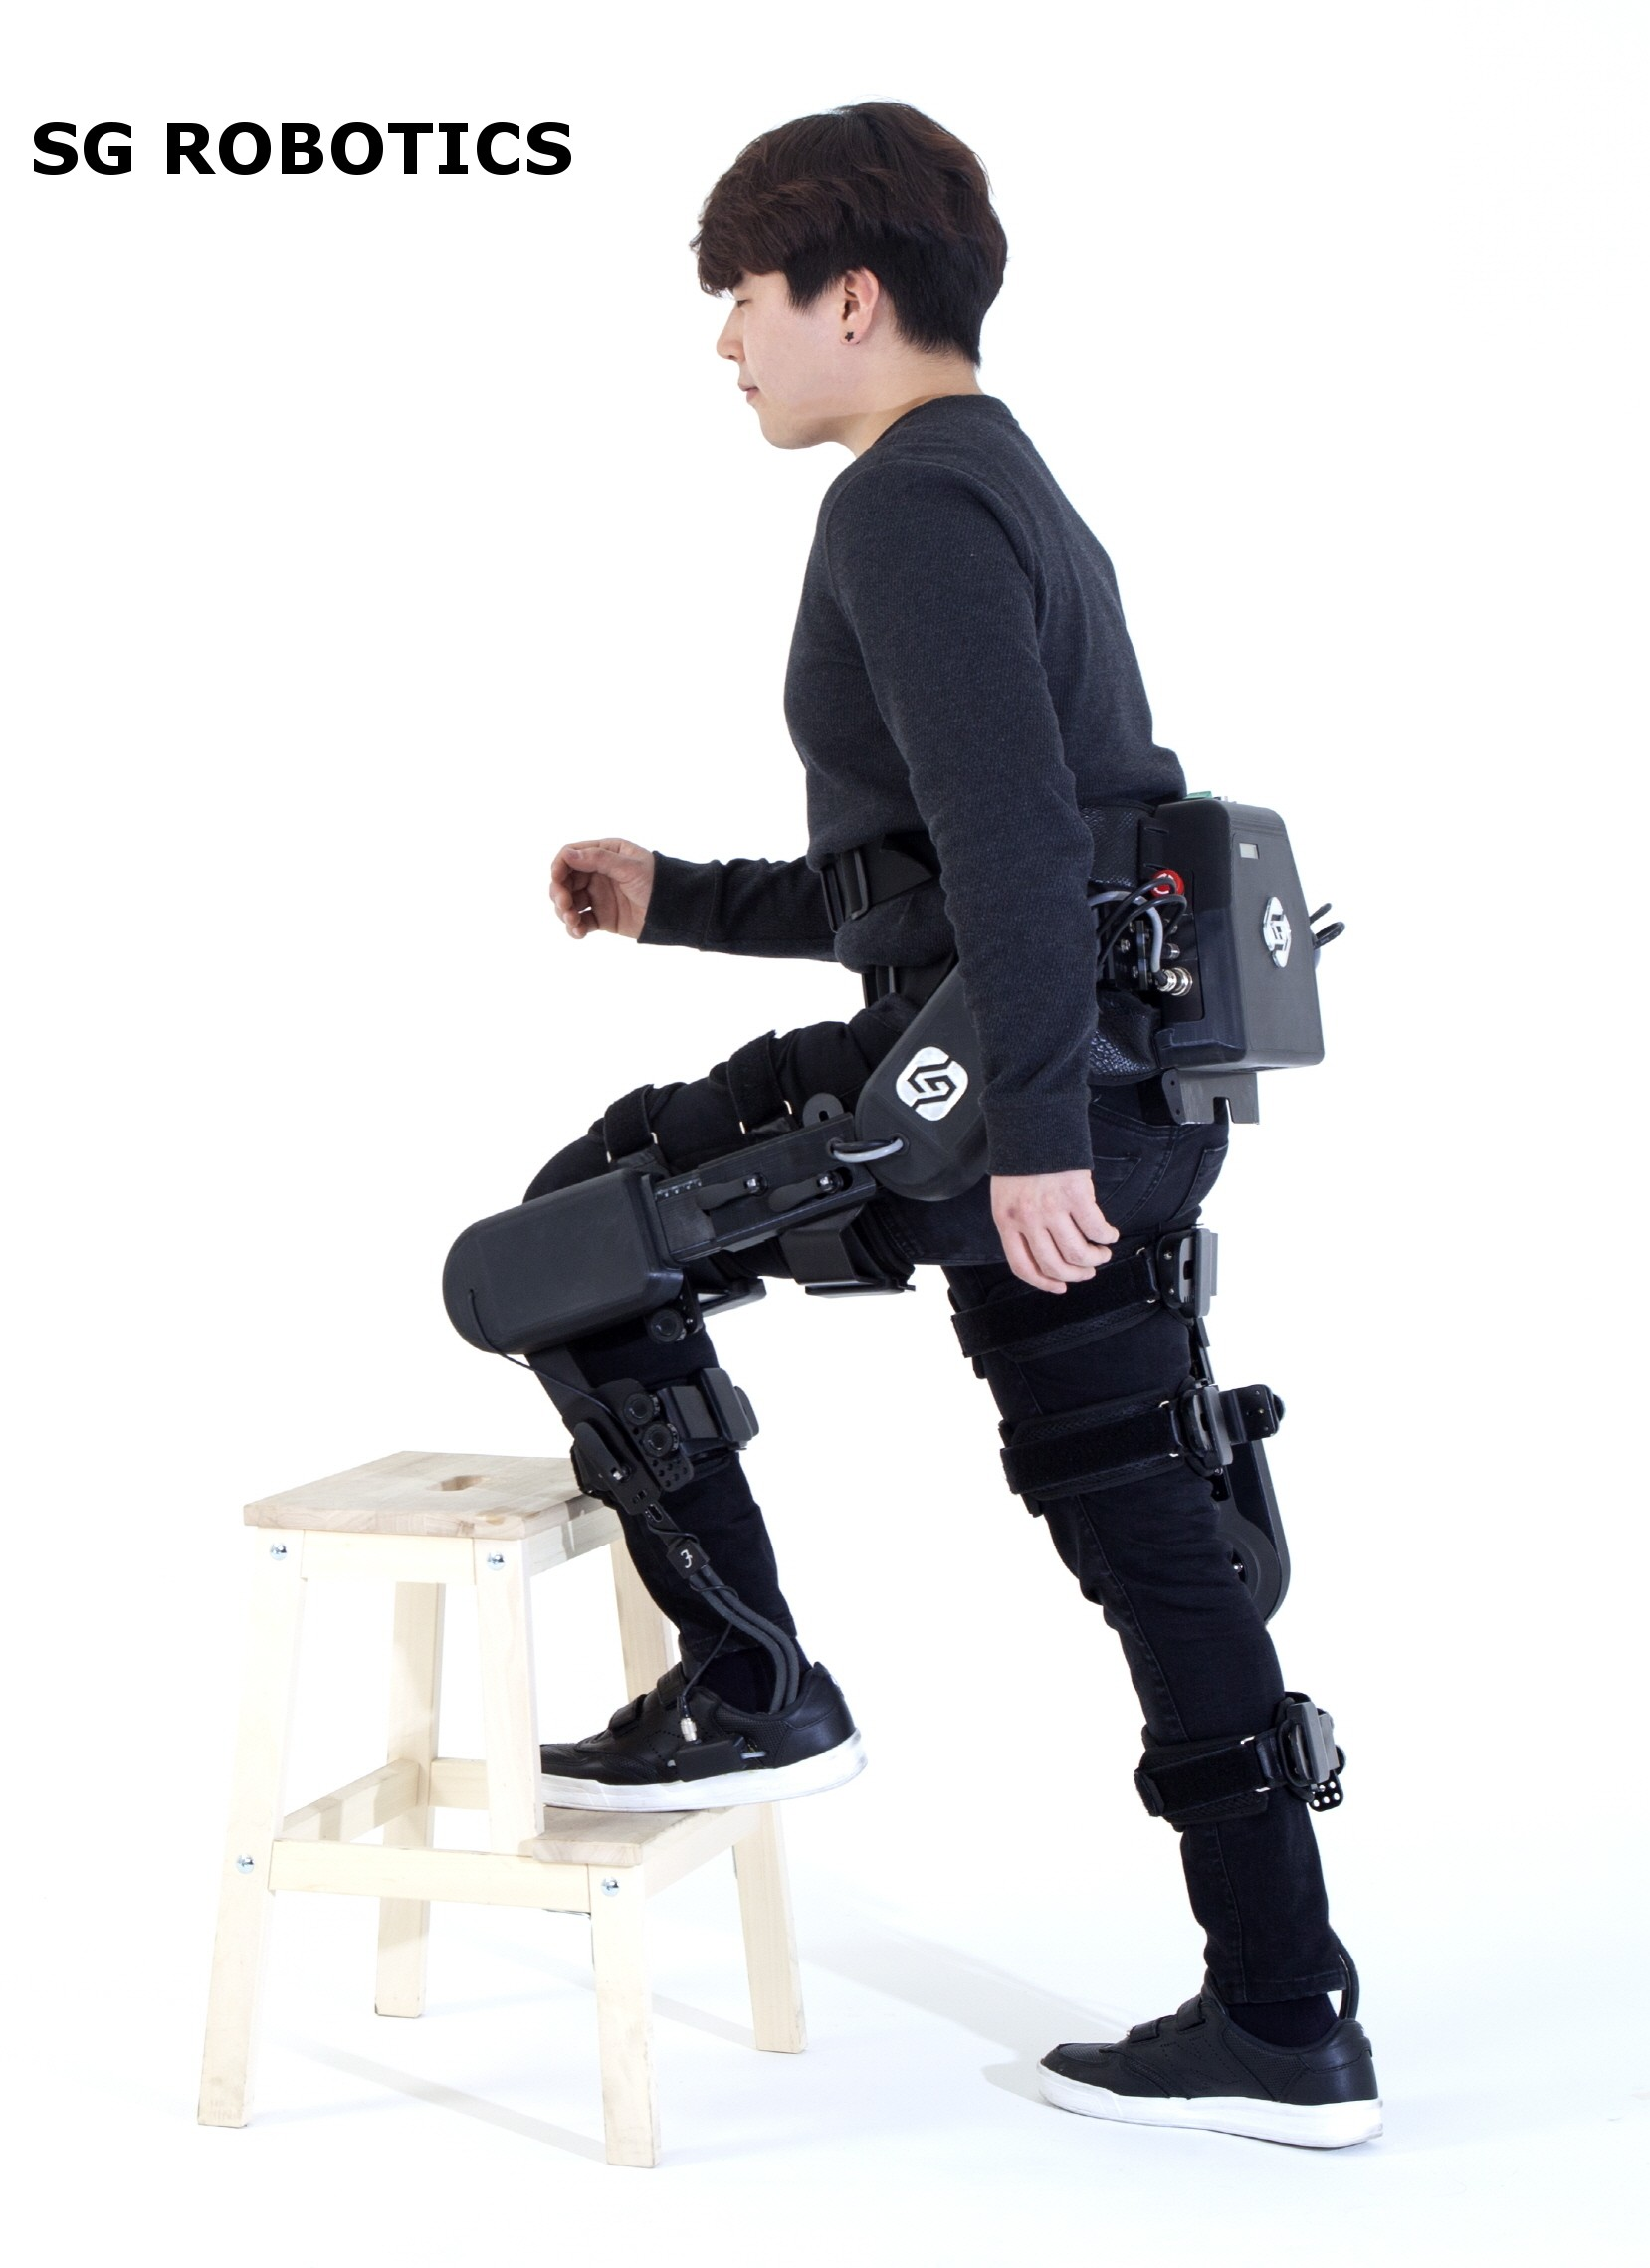 A model poses with SG Robotics equipment.